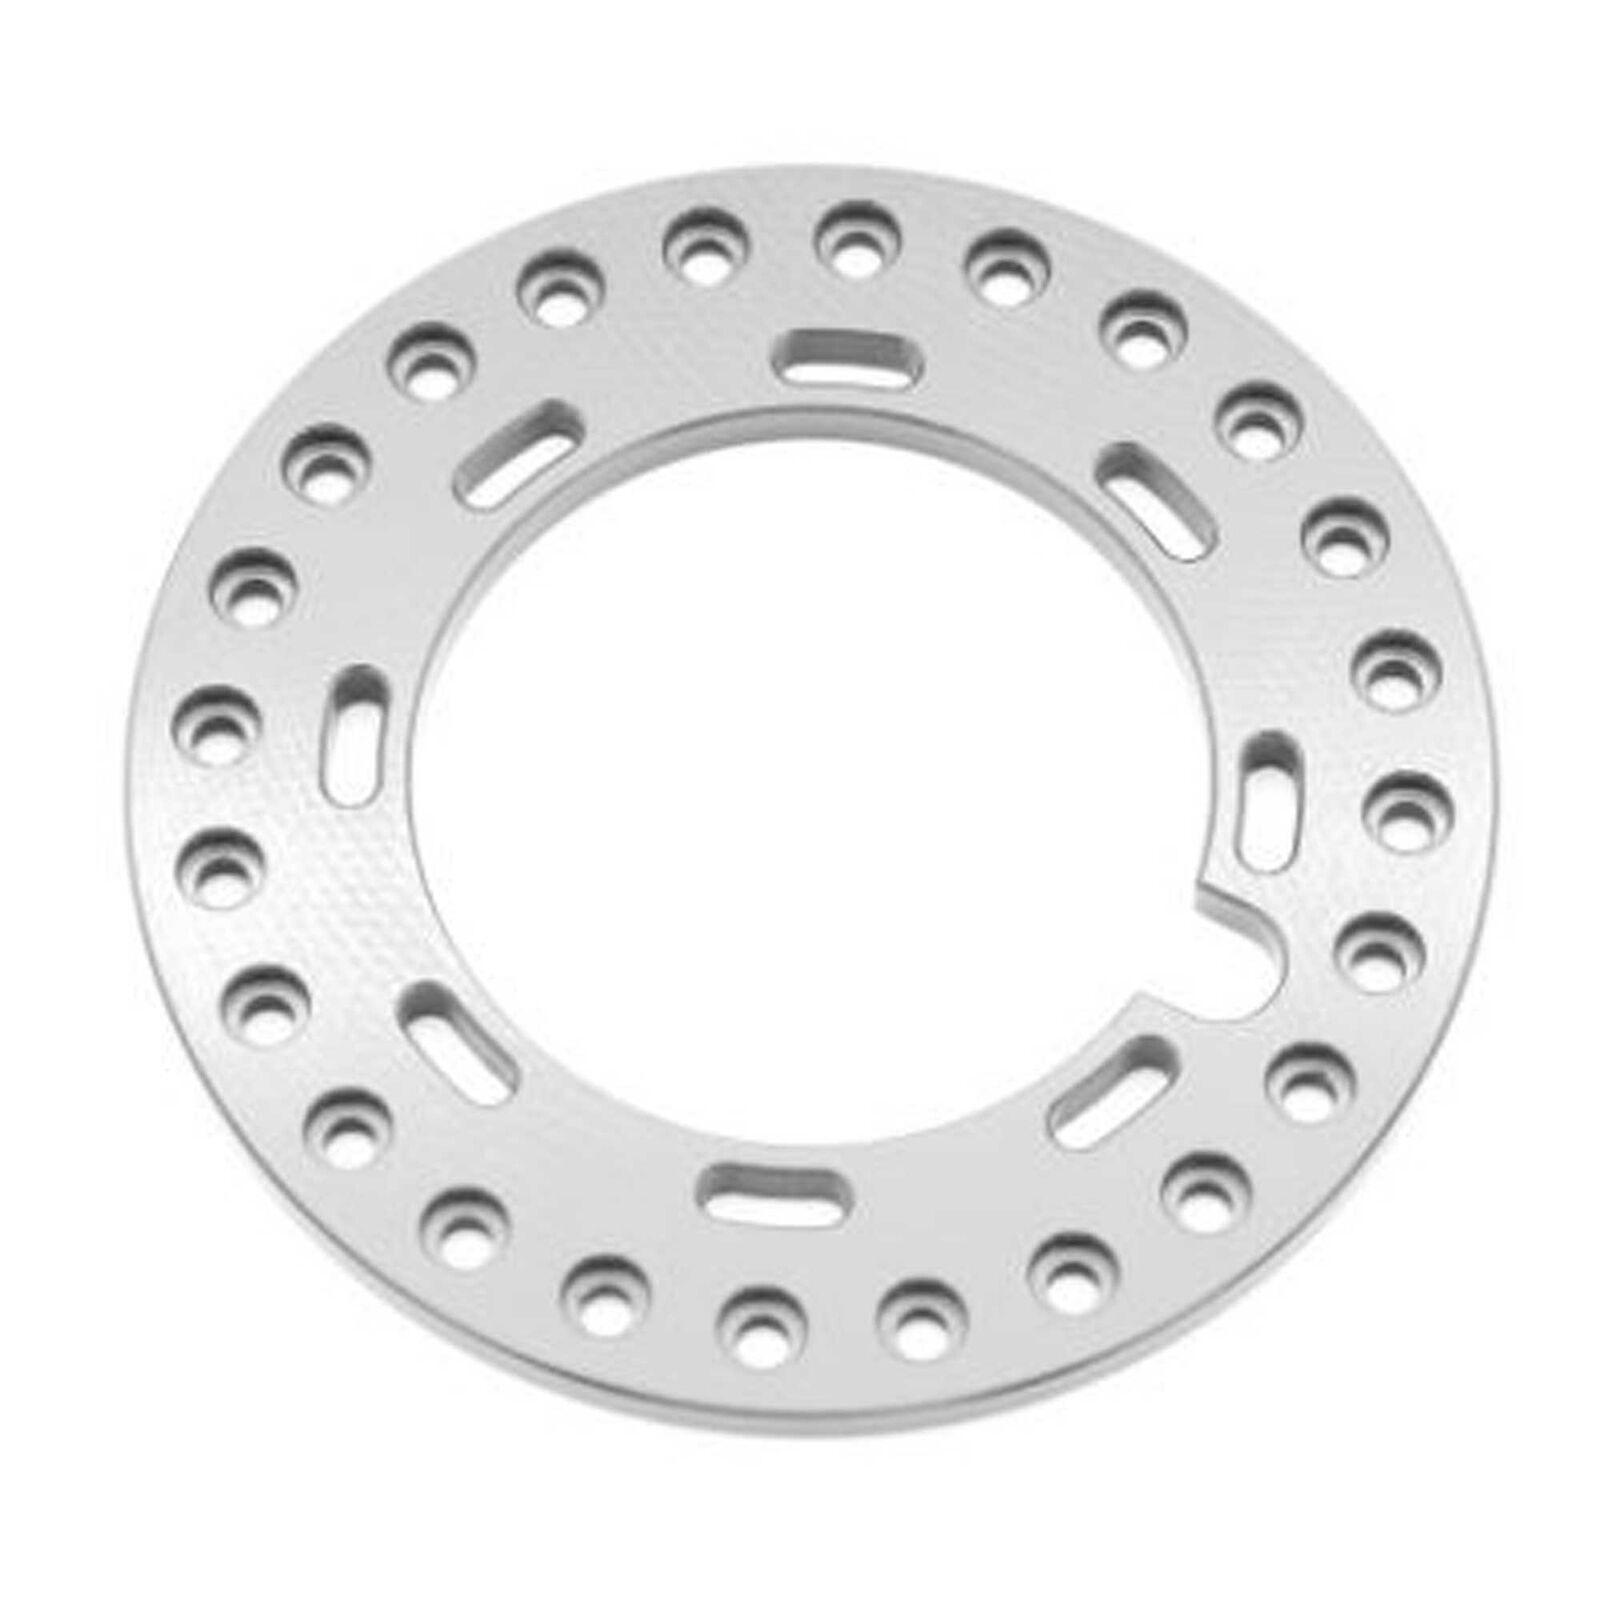 1.9 IBTR Beadlock Ring Clear Anodized